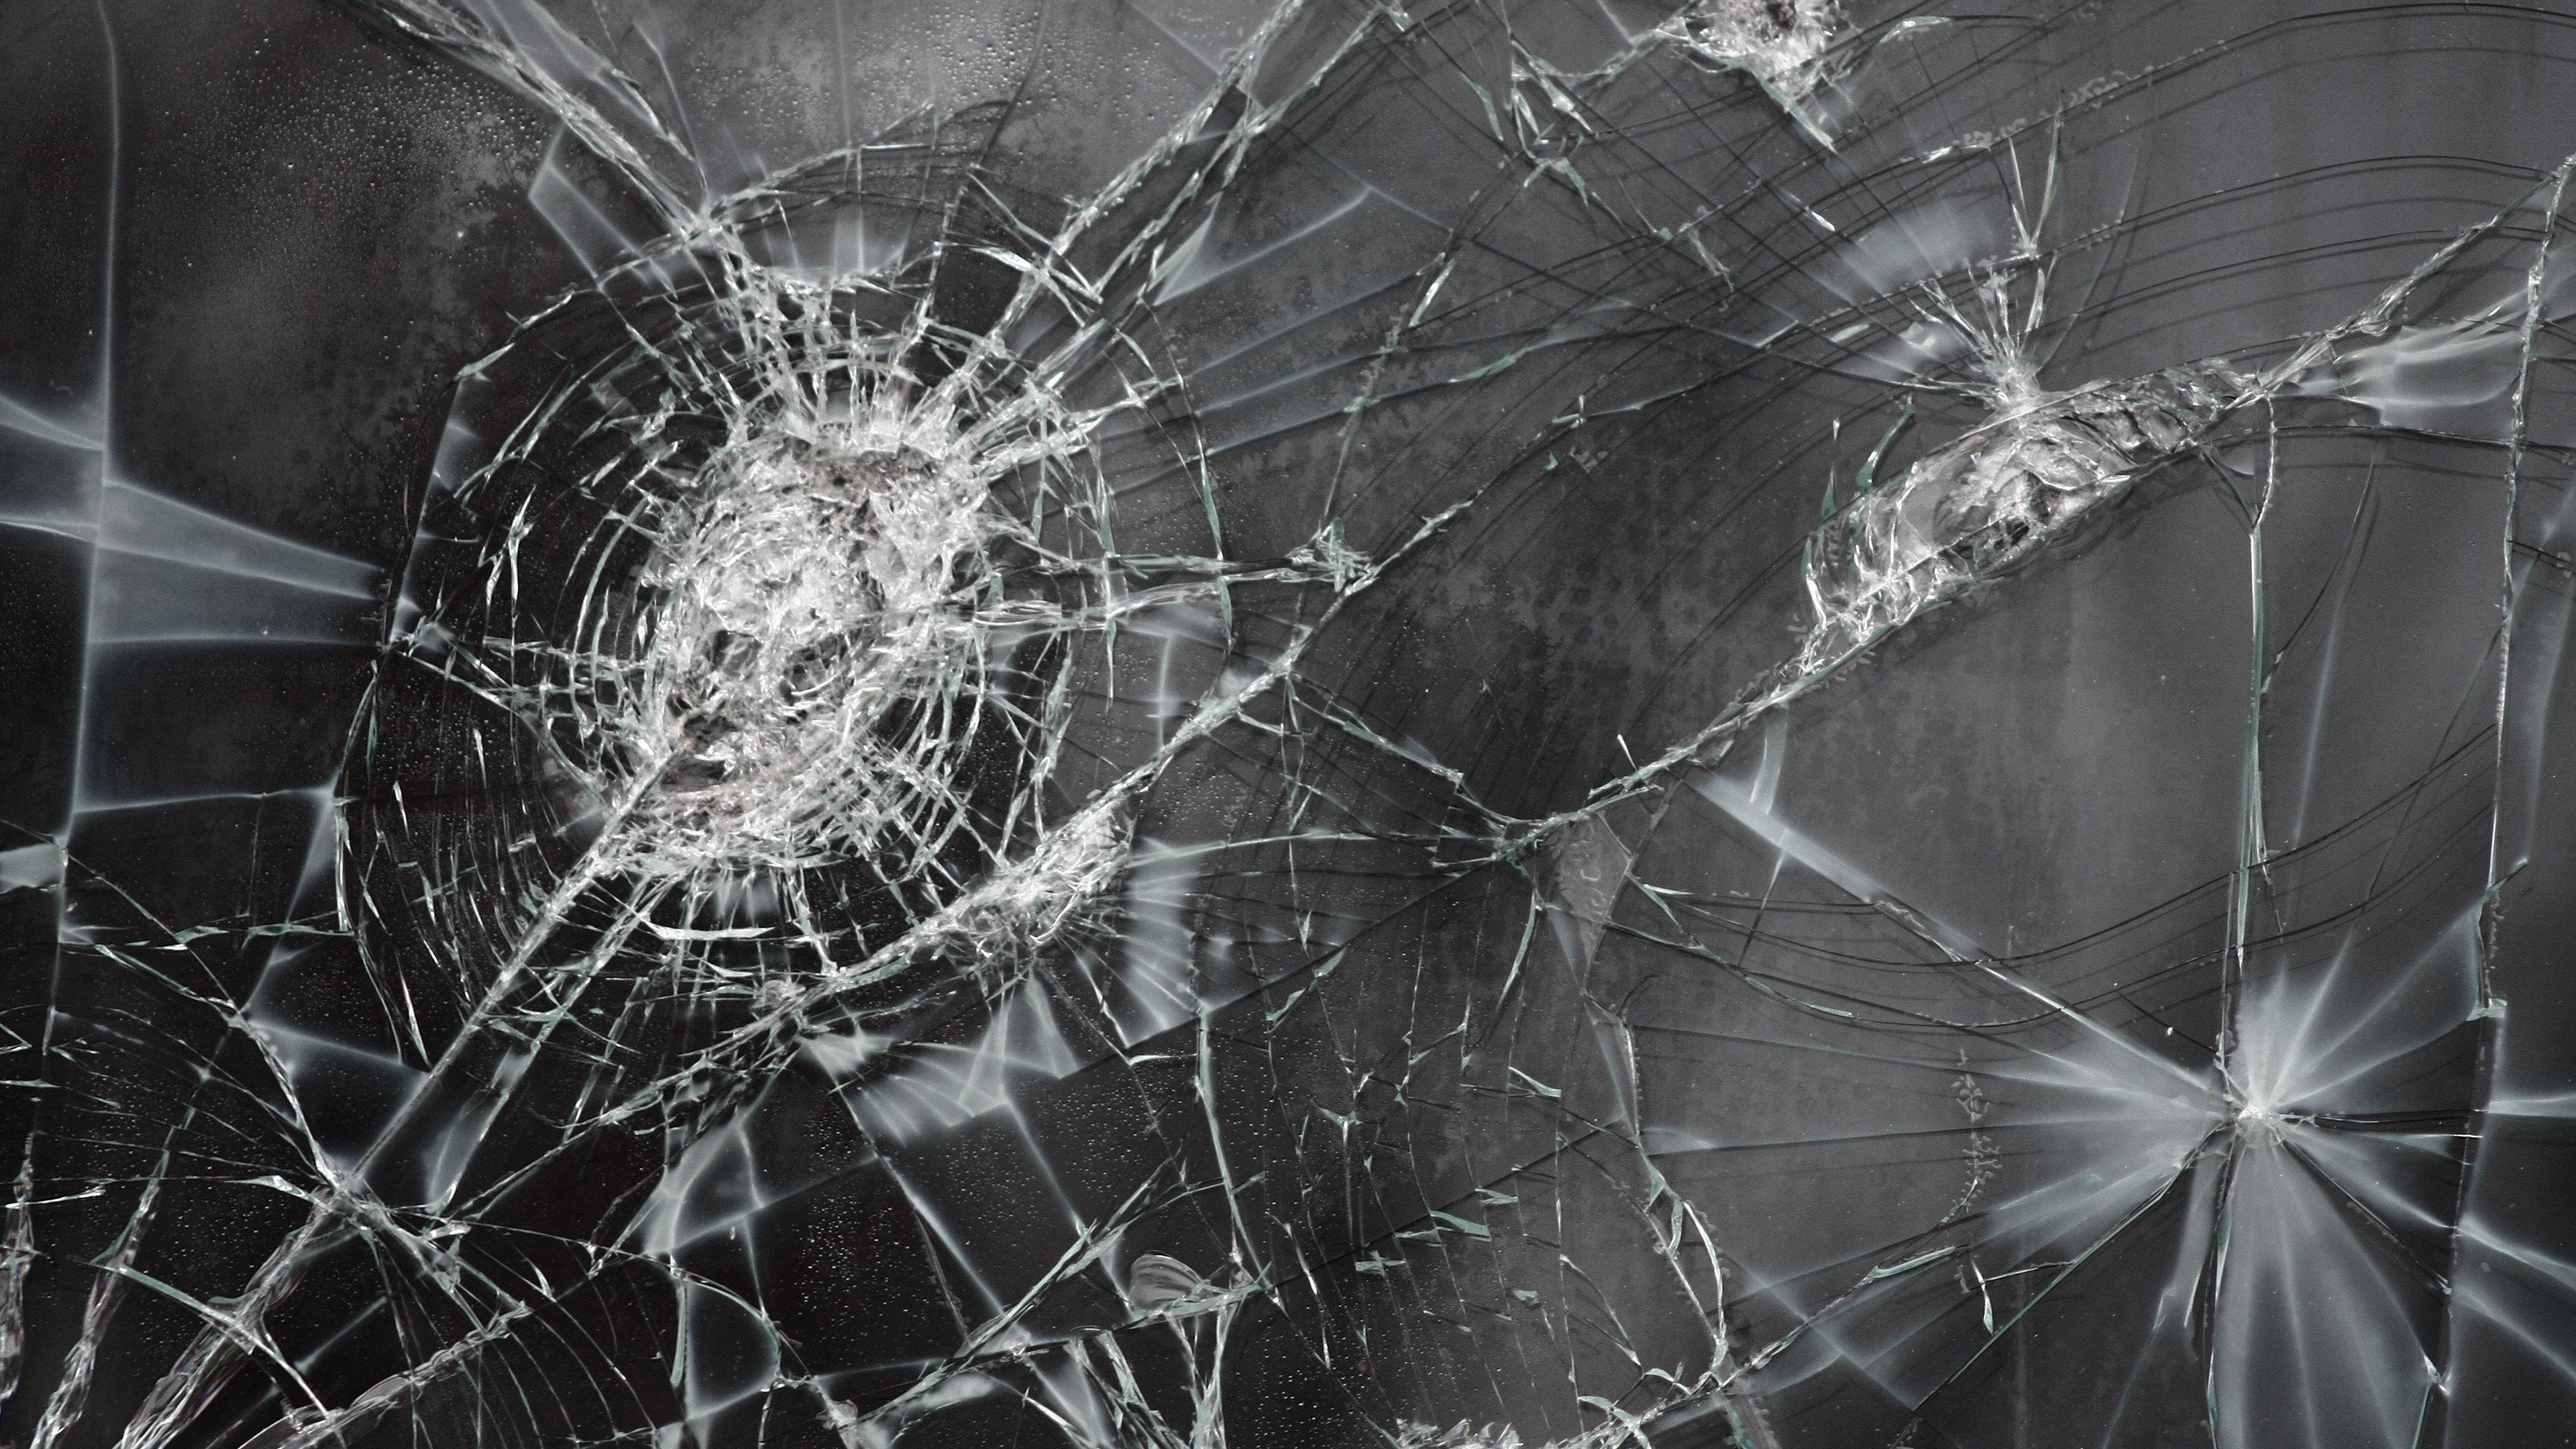 Broken Screen 4k Wallpaper Image